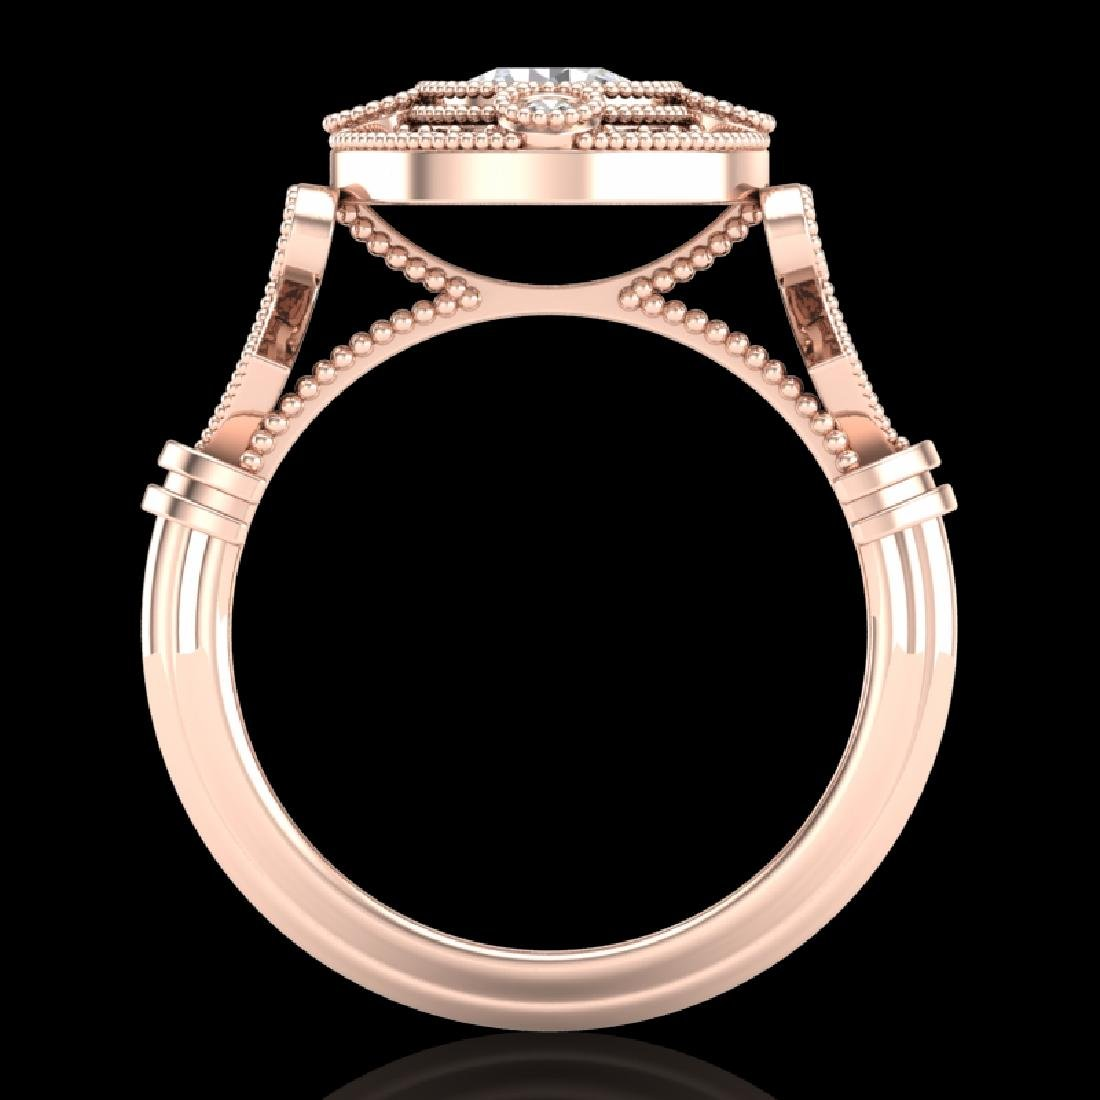 1.12 CTW VS/SI Diamond Solitaire Art Deco Ring 18K Rose